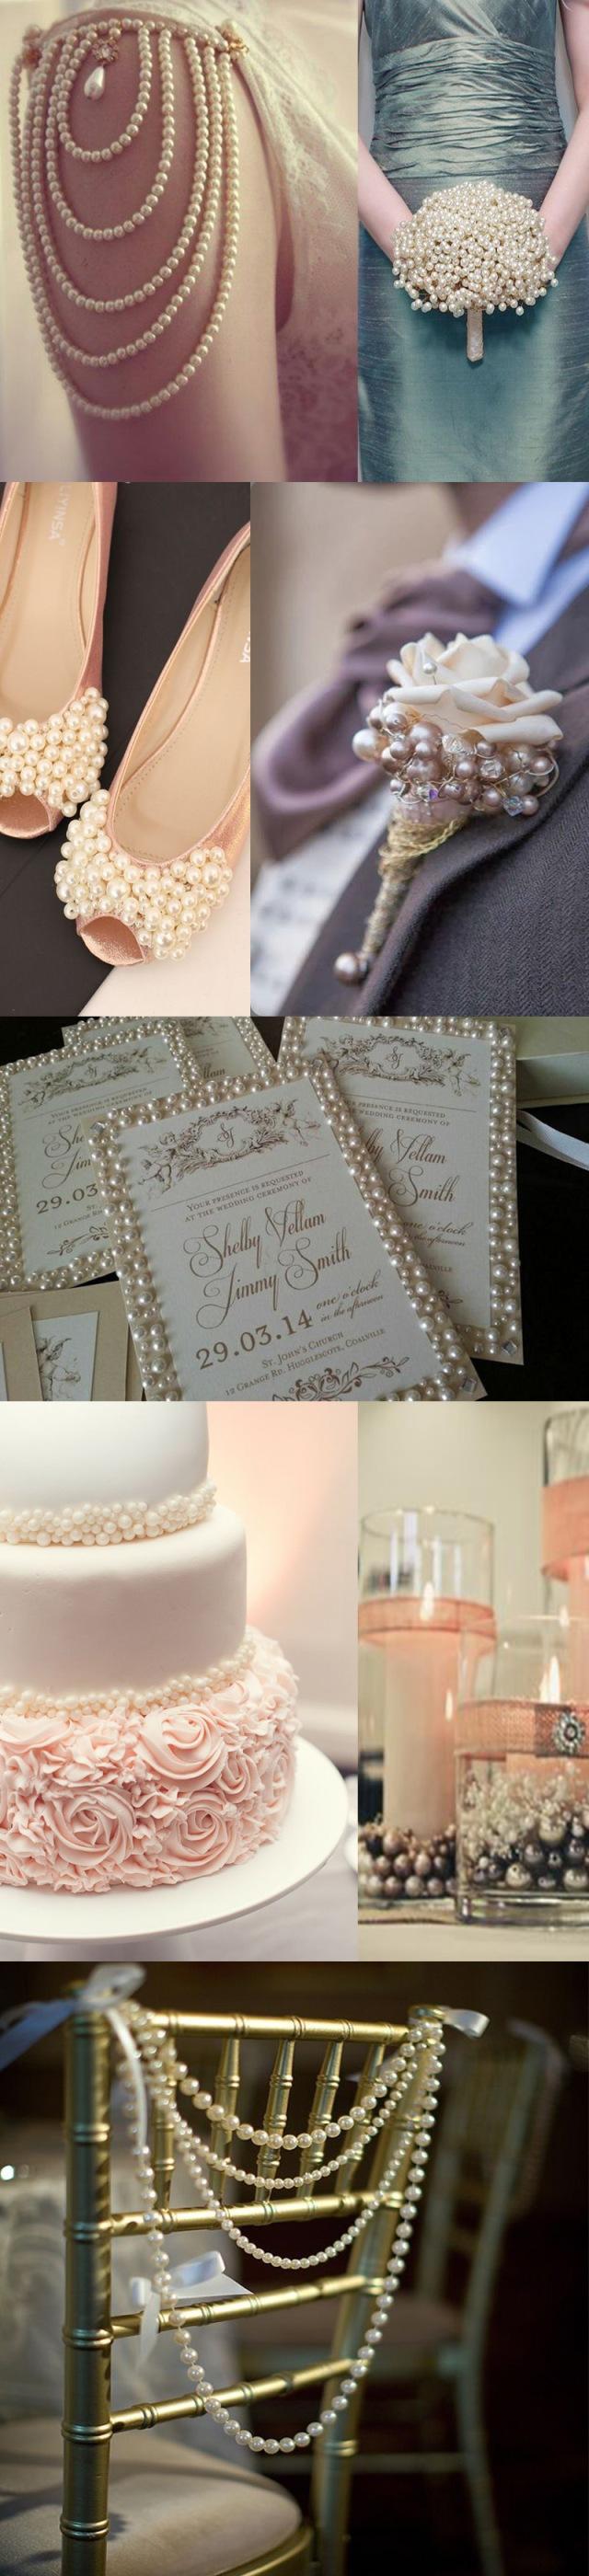 Pearl Wedding Inspiration from True Romance Weddings